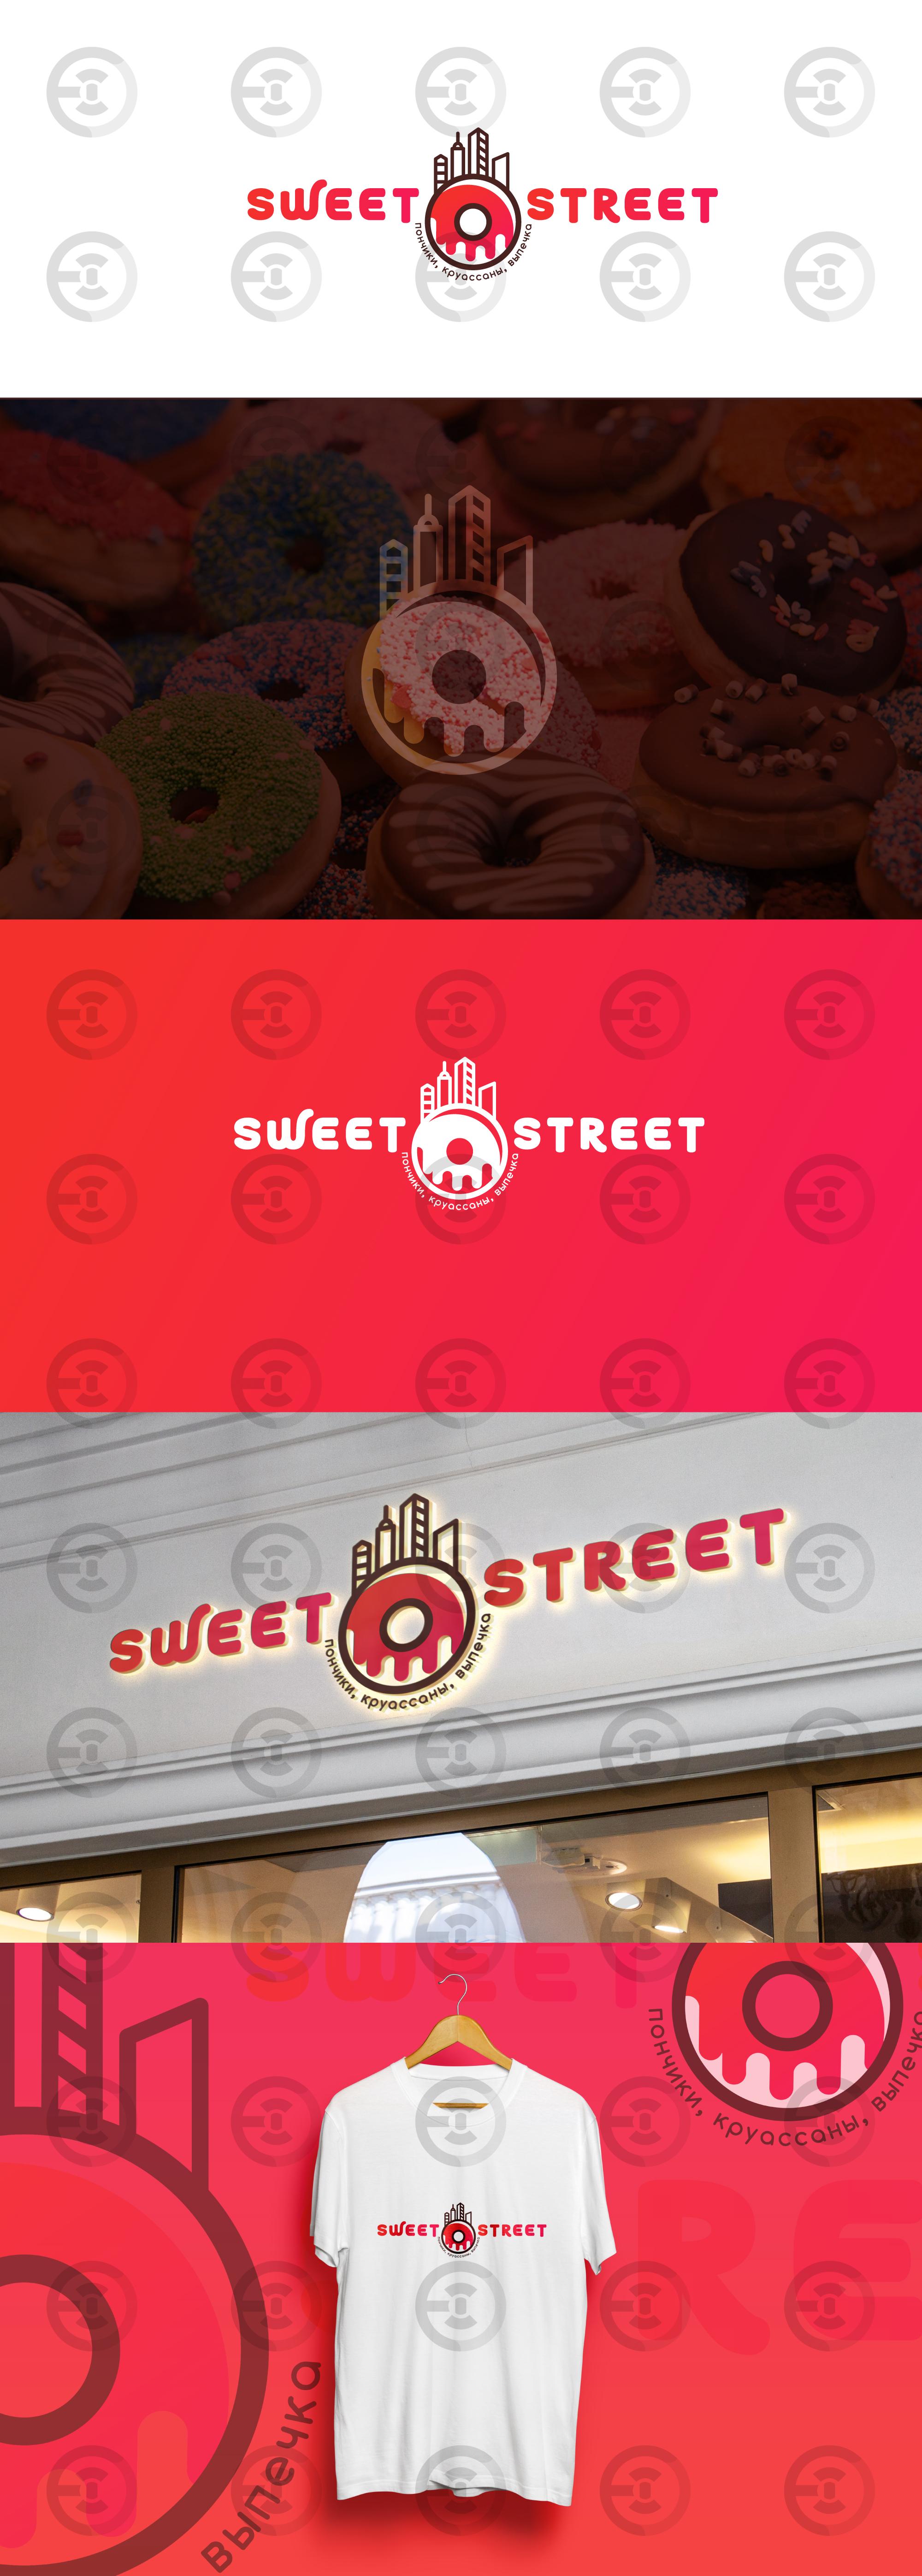 лого-свит-стрит1.jpg